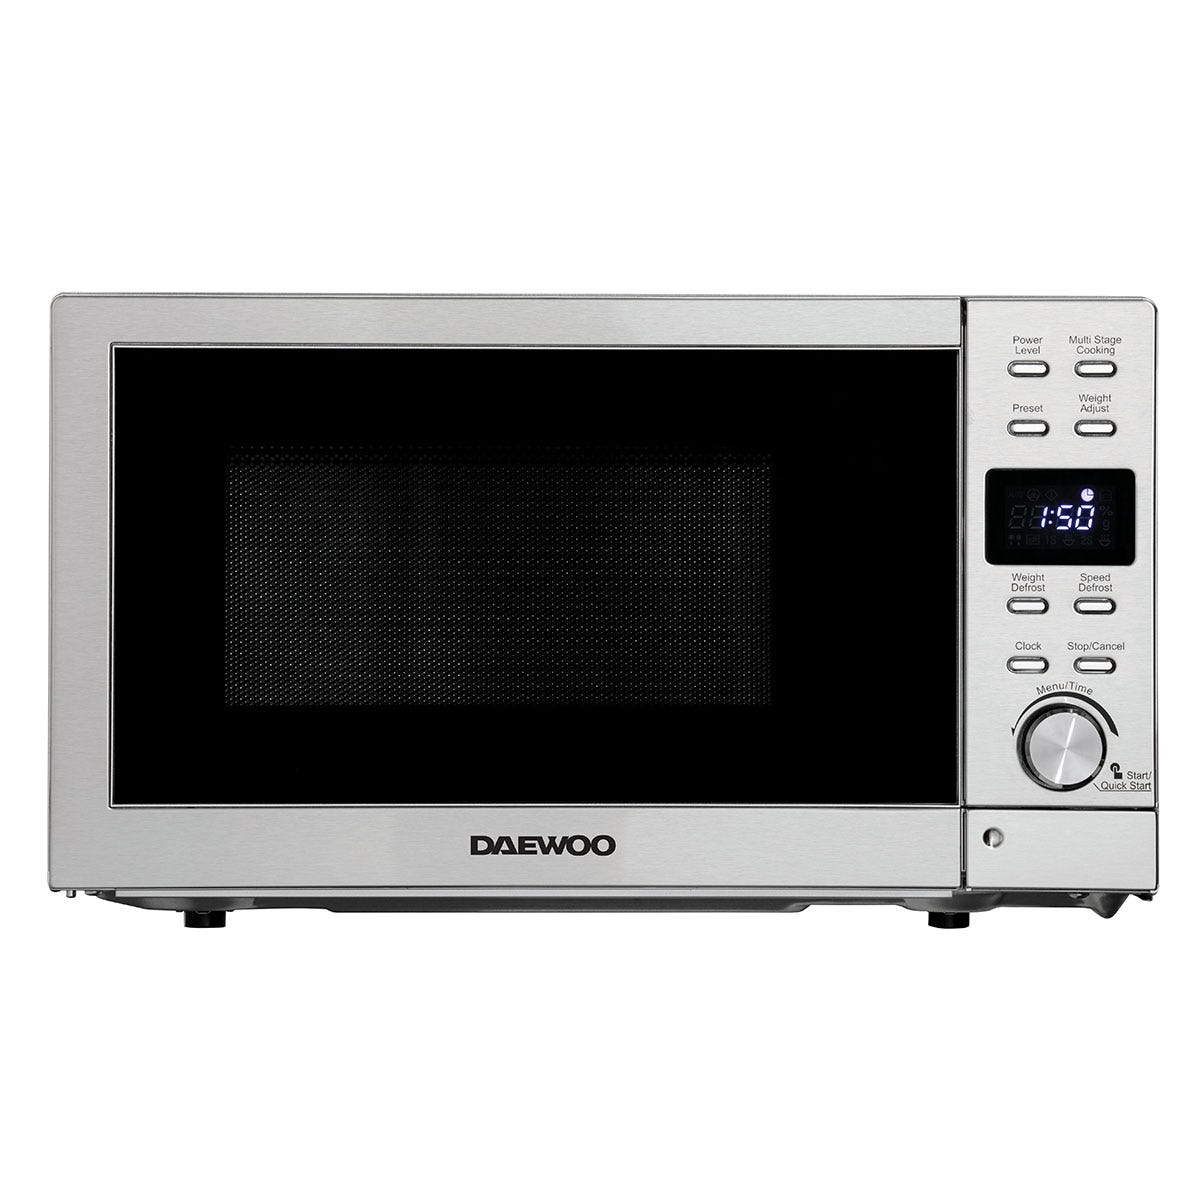 Daewoo SDA2089GE 20L 800W Microwave - Silver